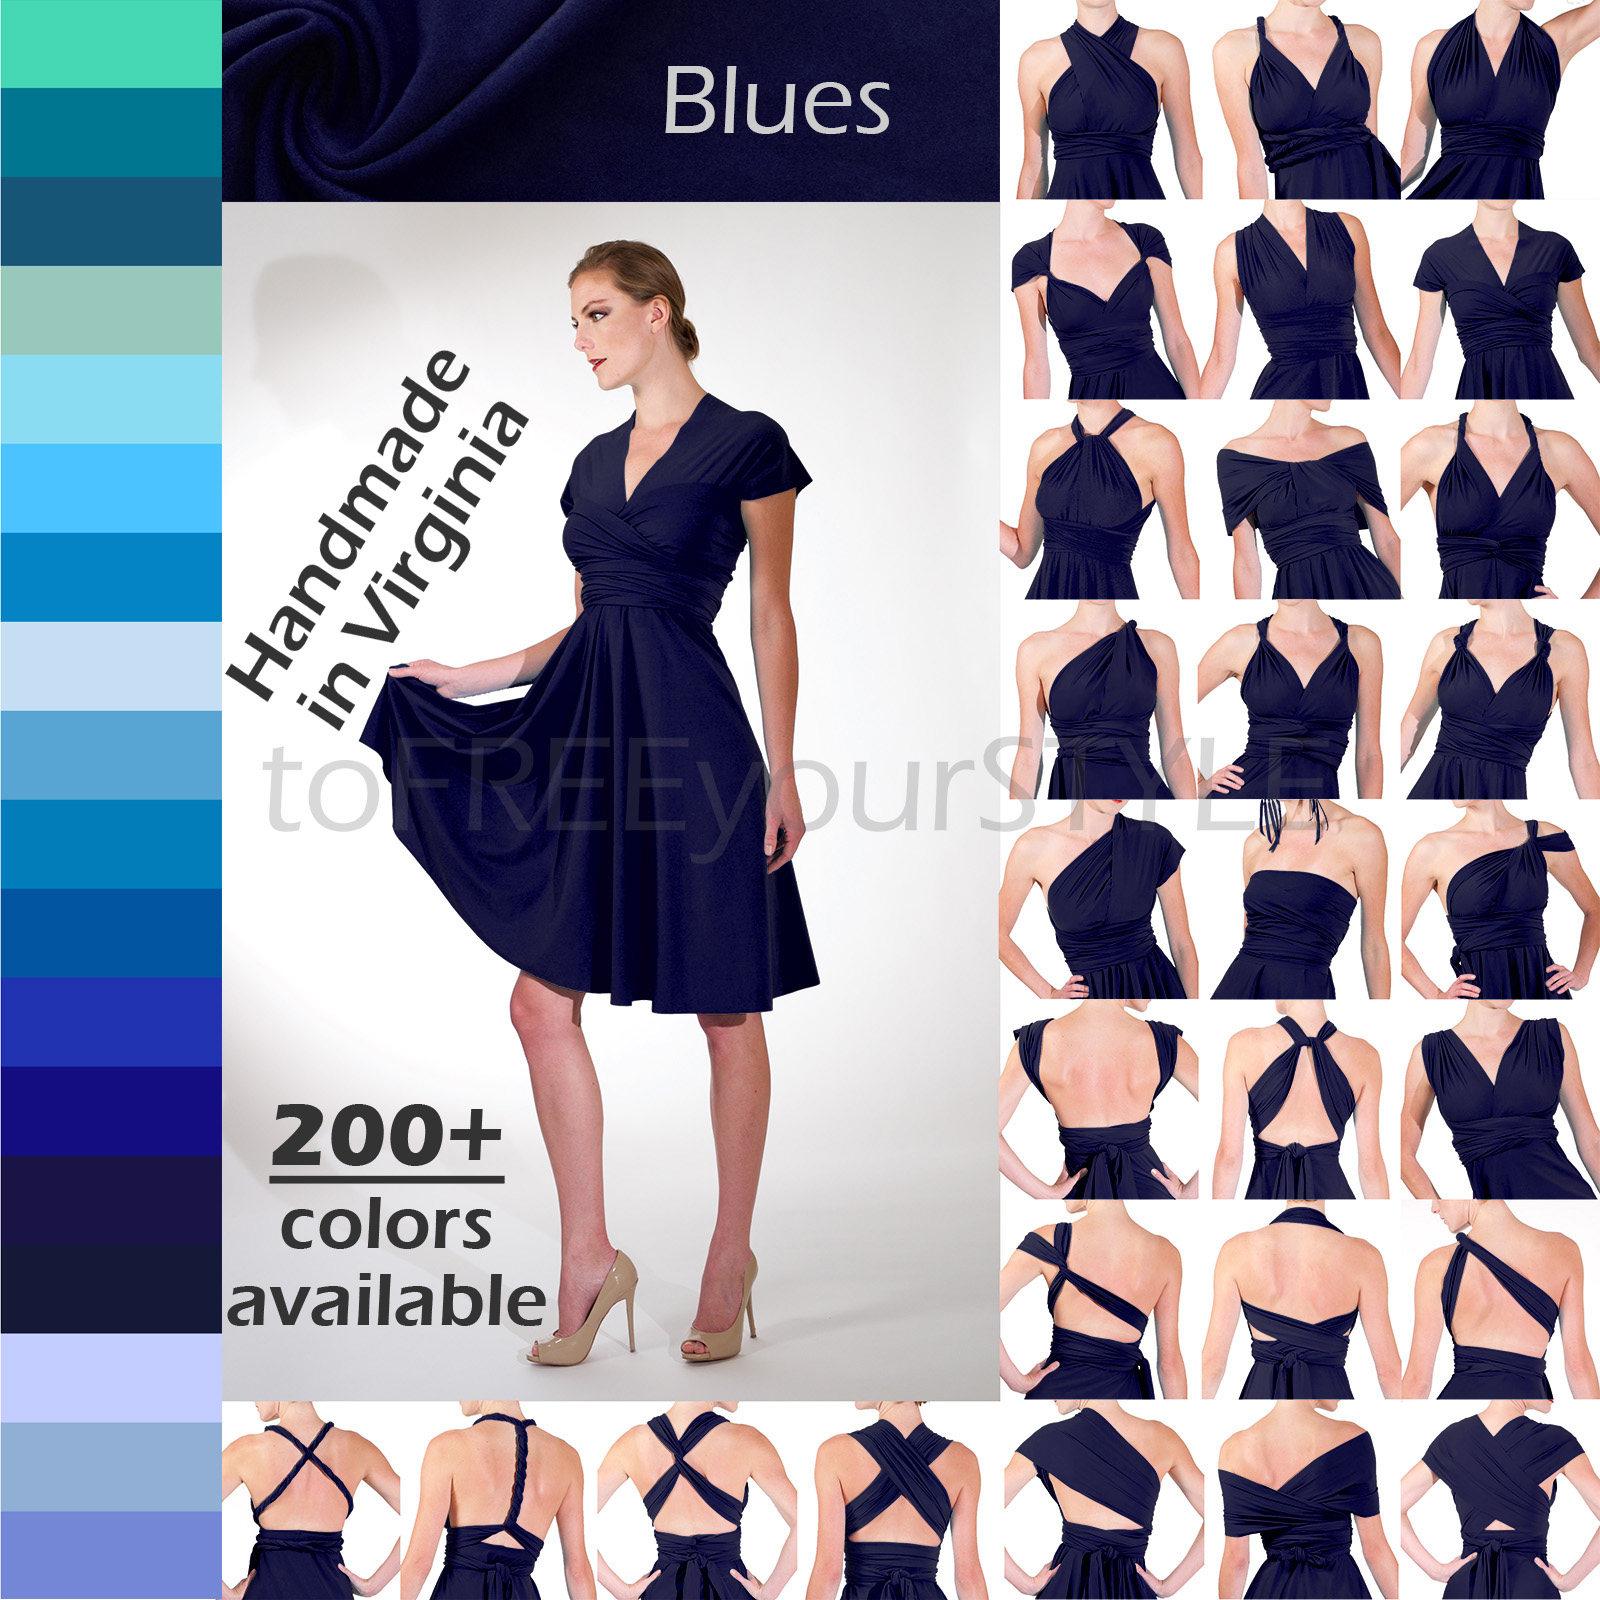 c39f662622 Infinity Dress, FULL style, bridesmaid dress, convertible dress, wrap  dress, Custom Handmade, 200+ colors, Any Size & Length